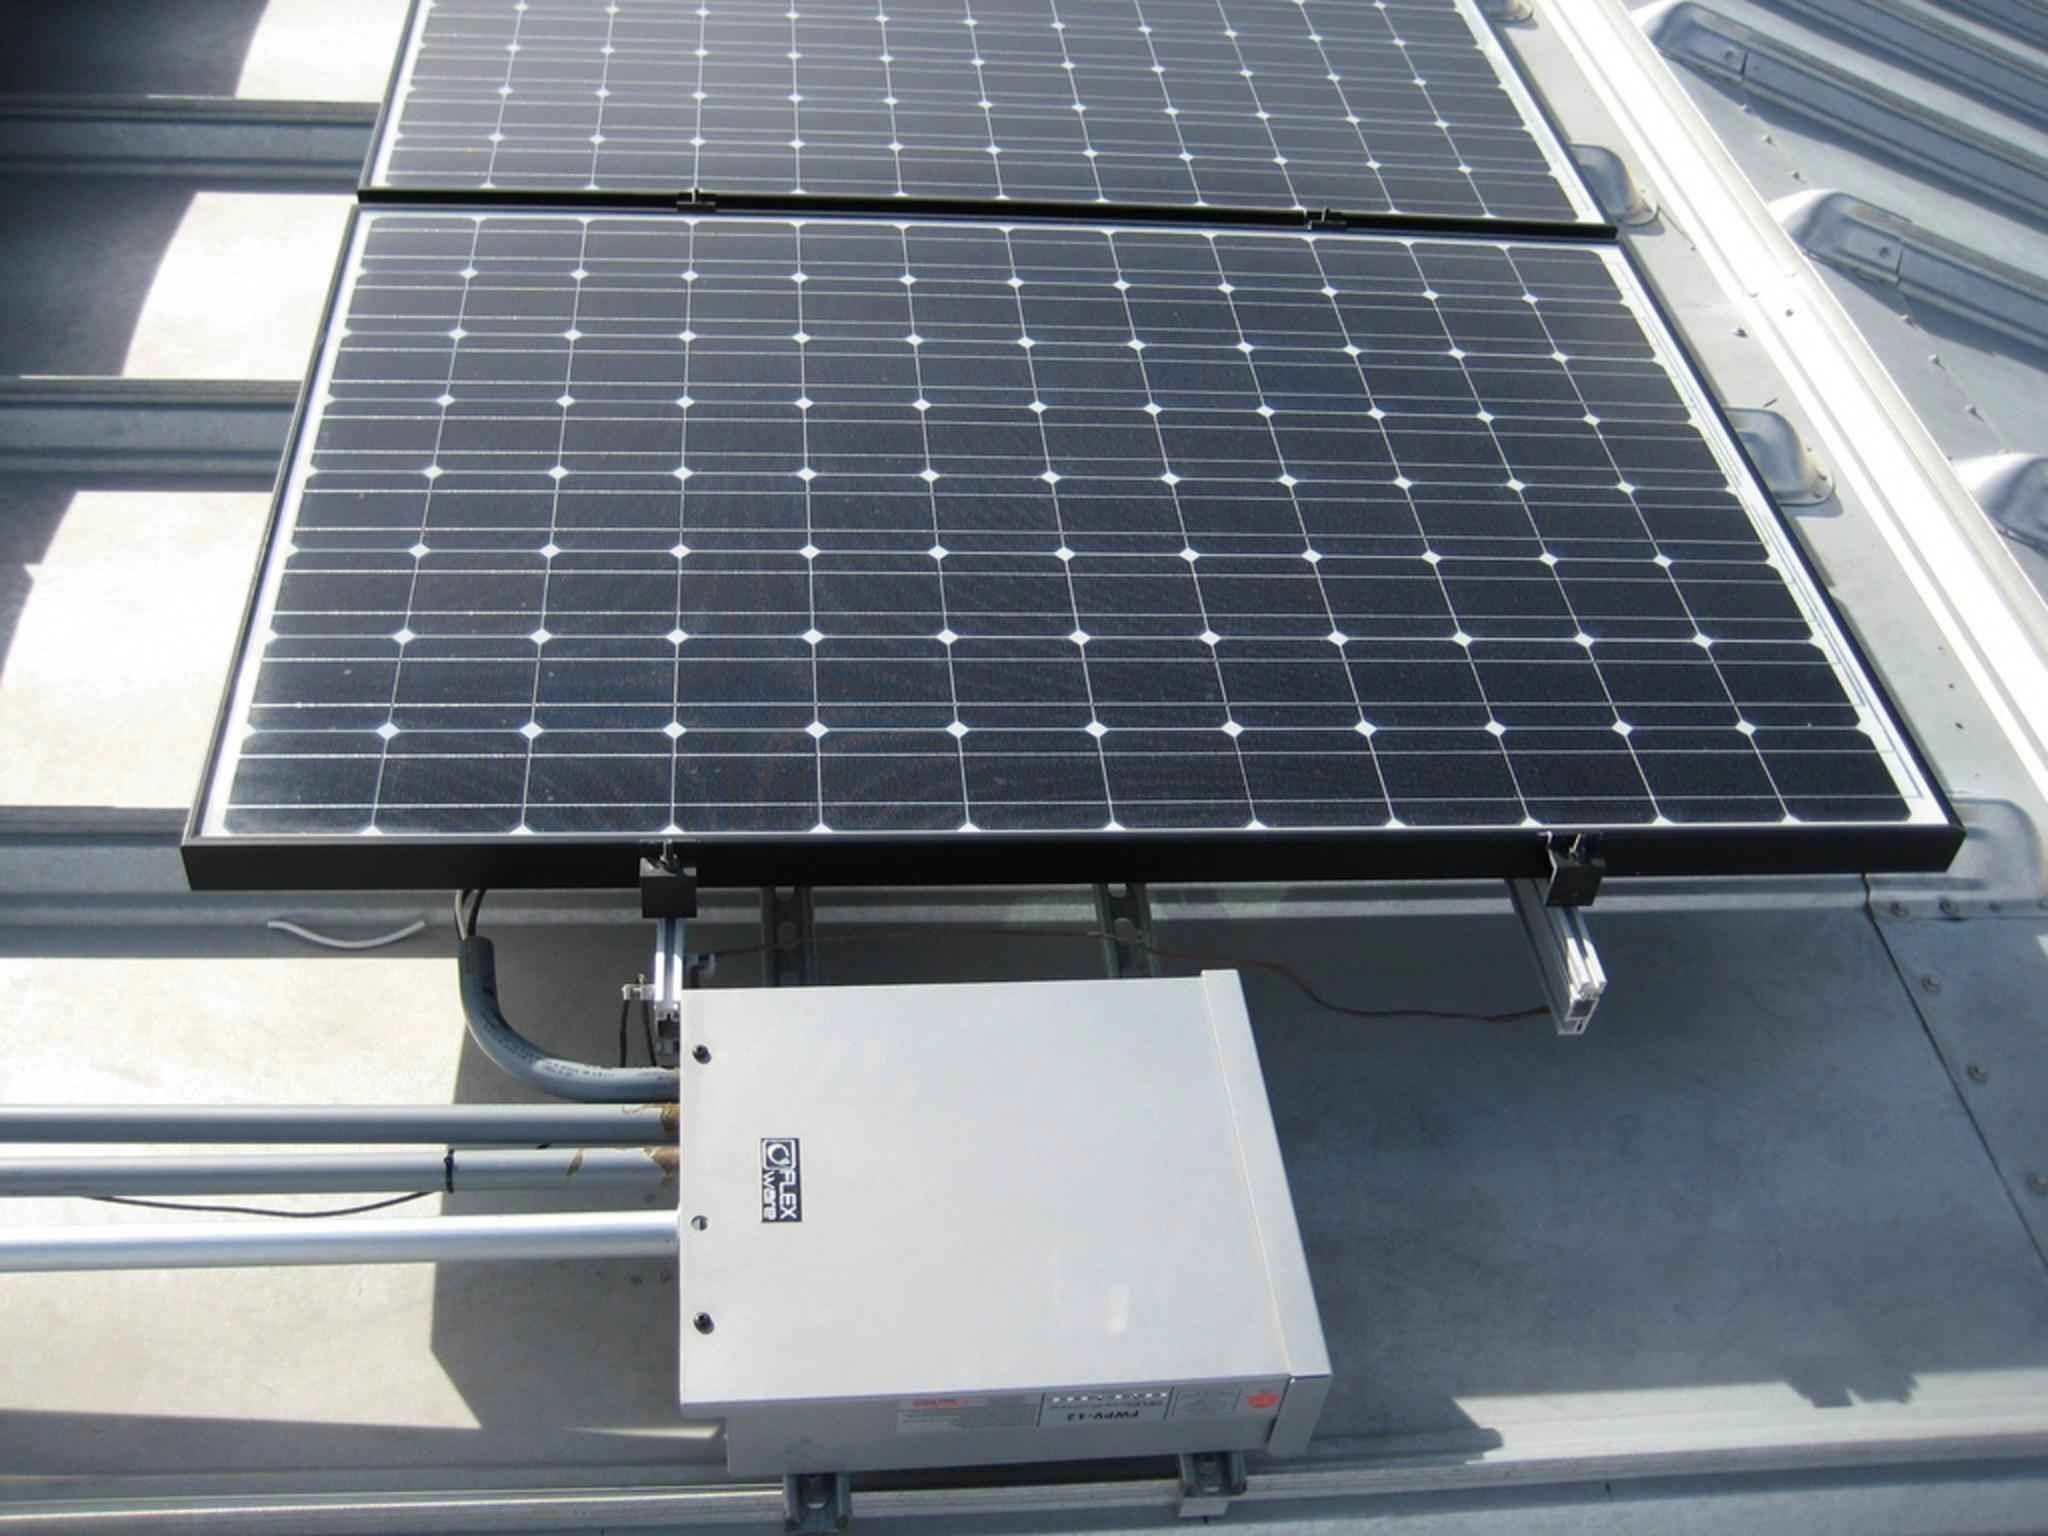 Pin On Solar Panel Install Tips